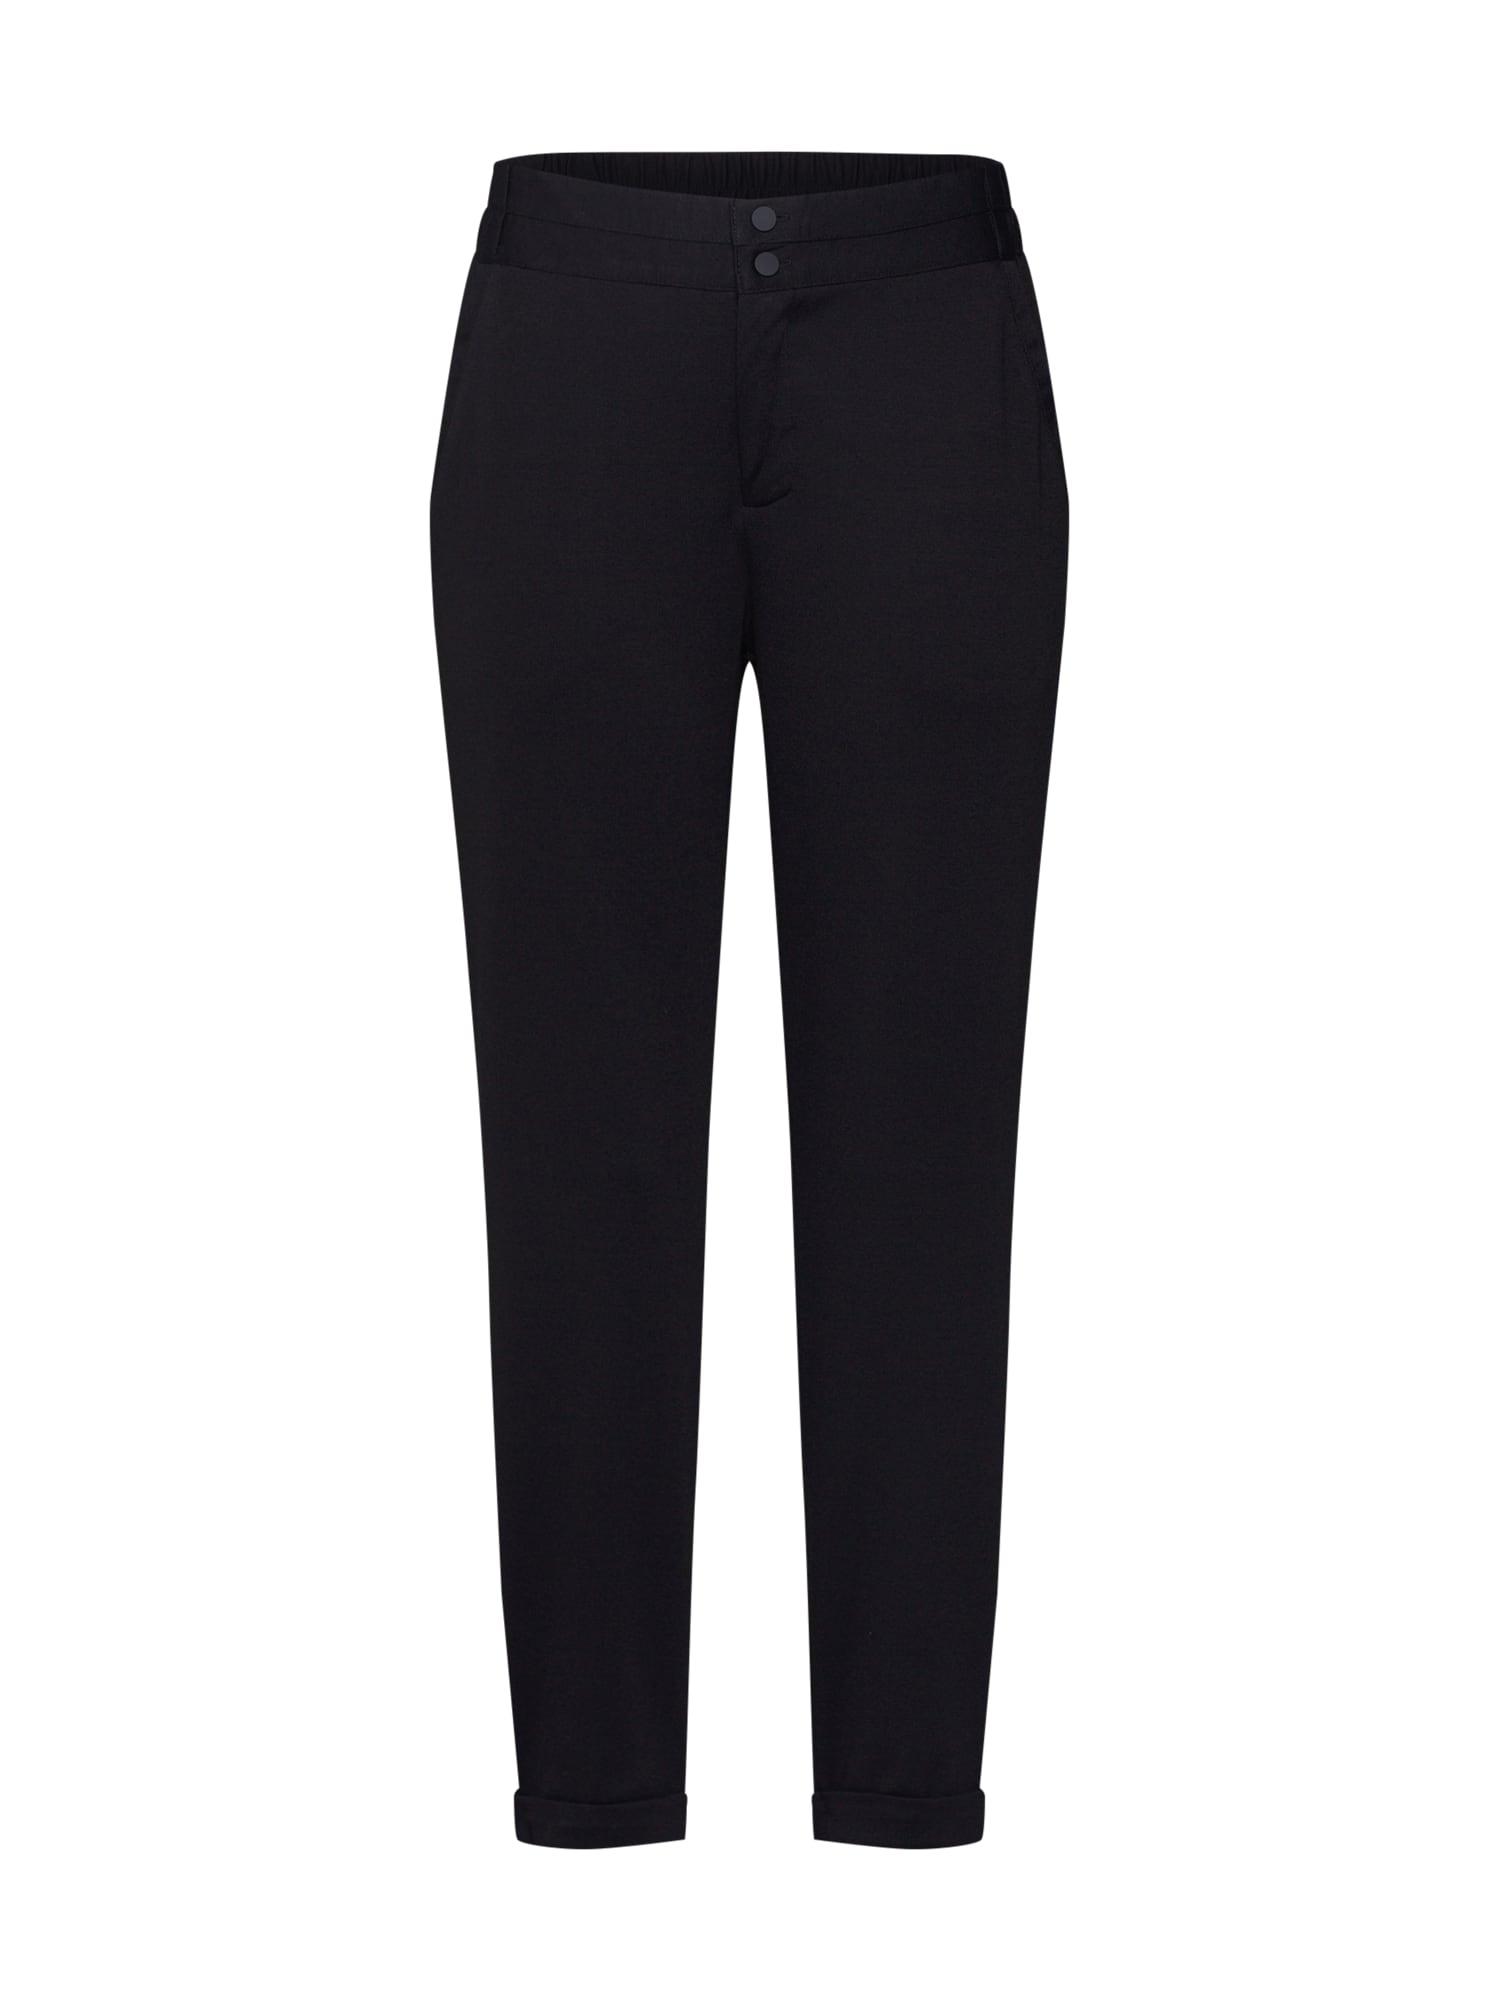 Freequent Chino stiliaus kelnės 'NANNI' juoda